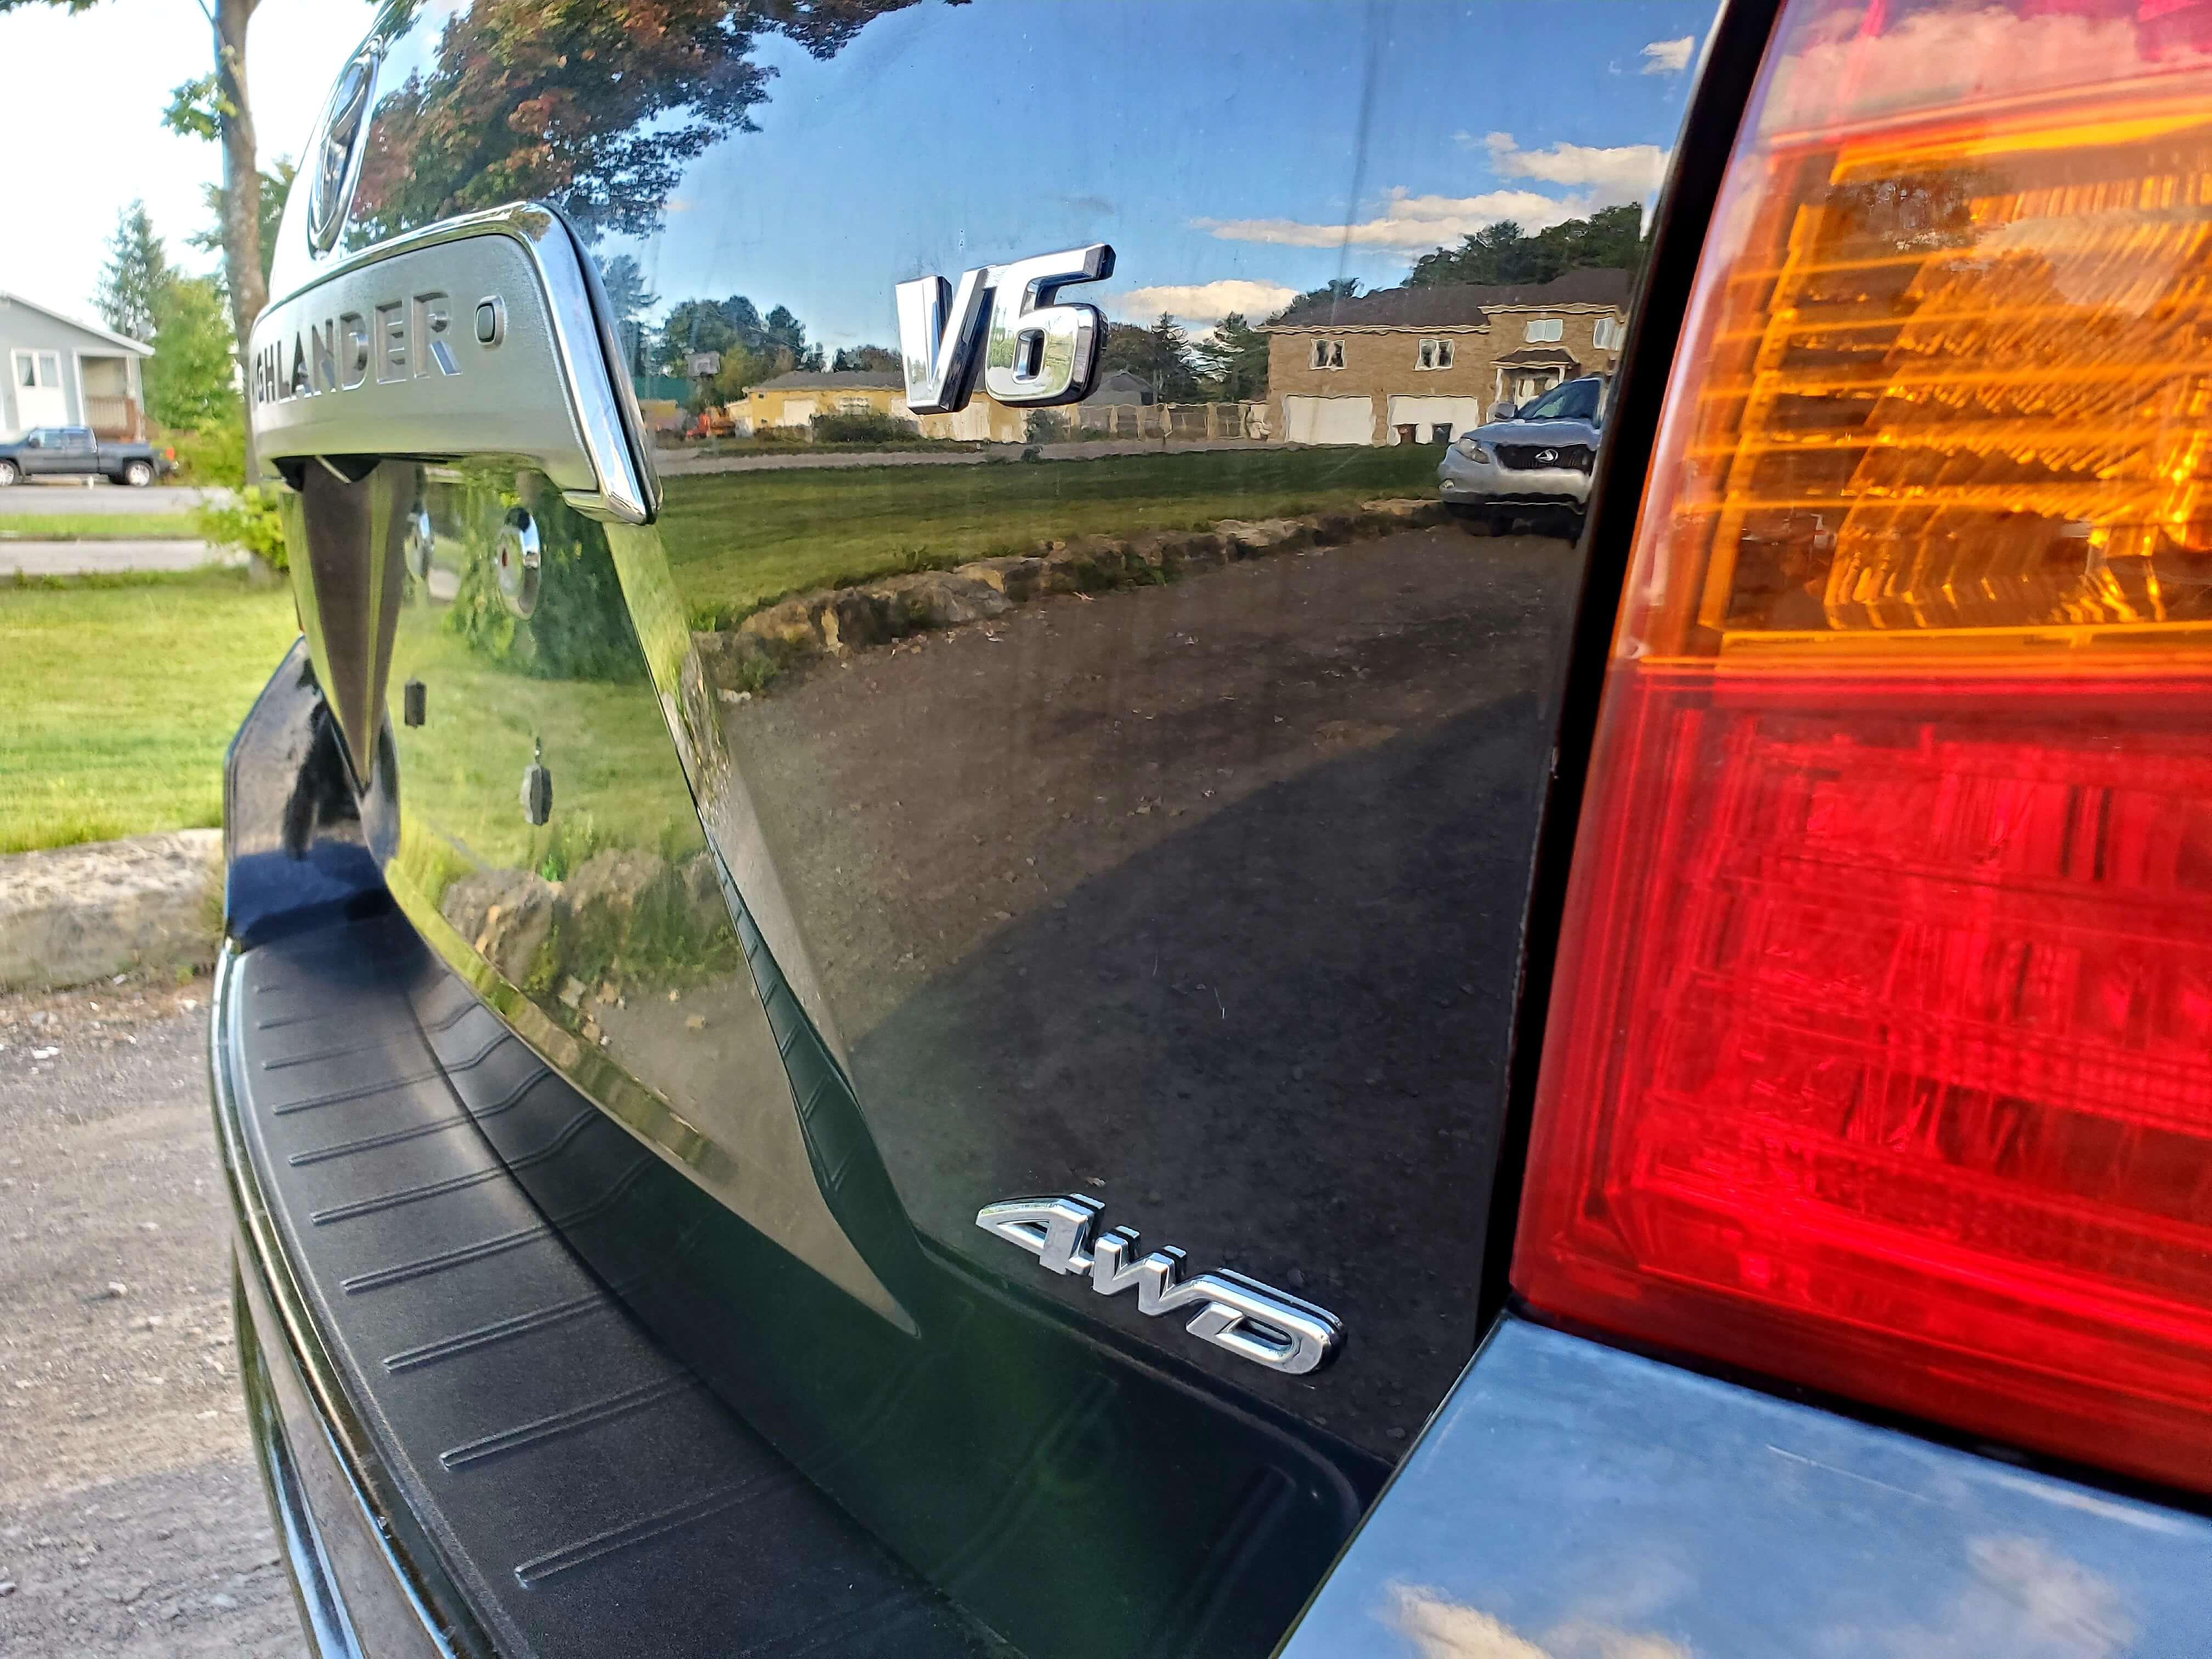 2008 TOYOTA HIGH LANDER SPORT V6 7 SEATS CAMERA,  SUNROOF, LEATHER complet